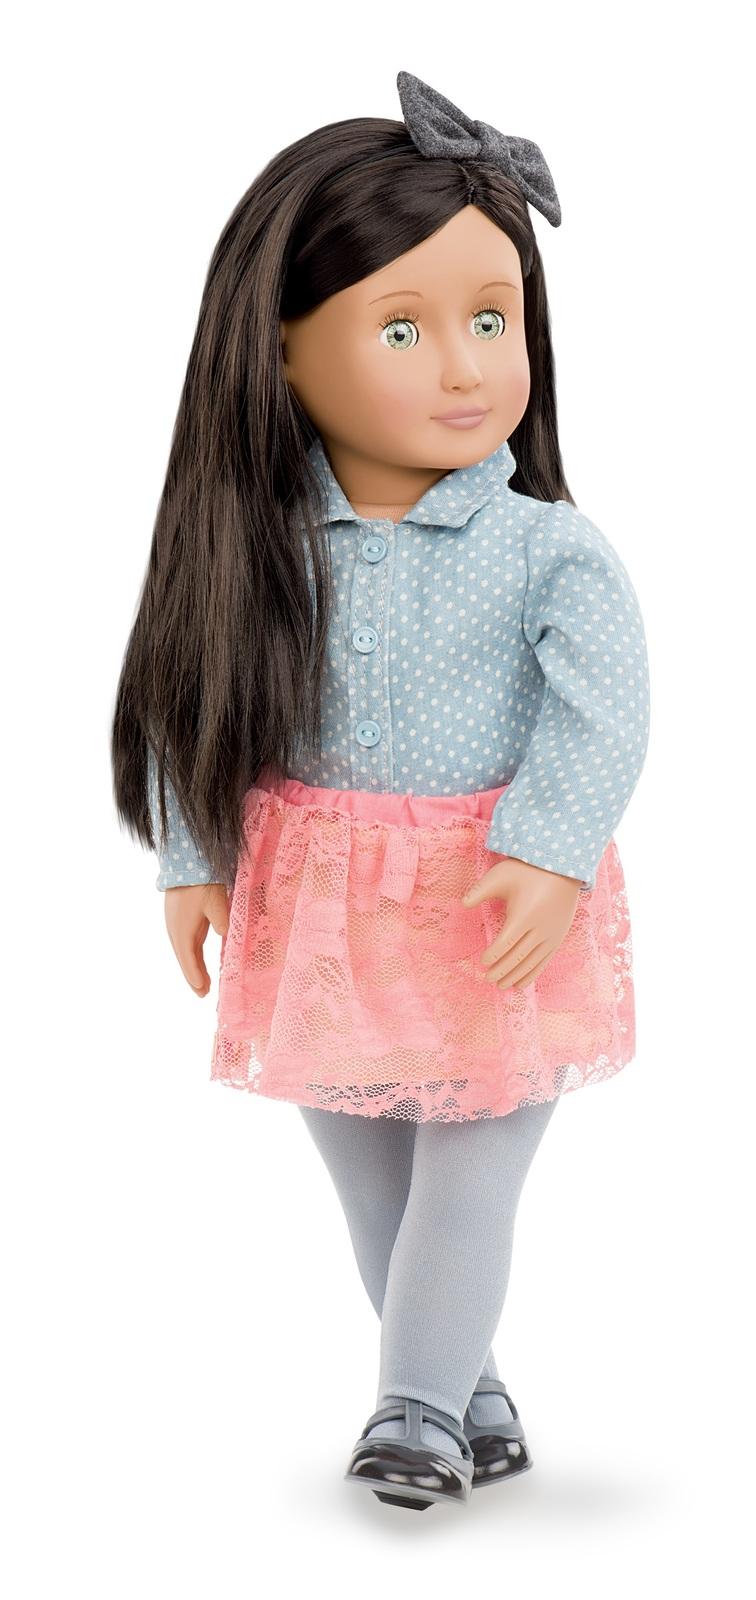 "Our Generation: 18"" Regular Doll - Elyse image"